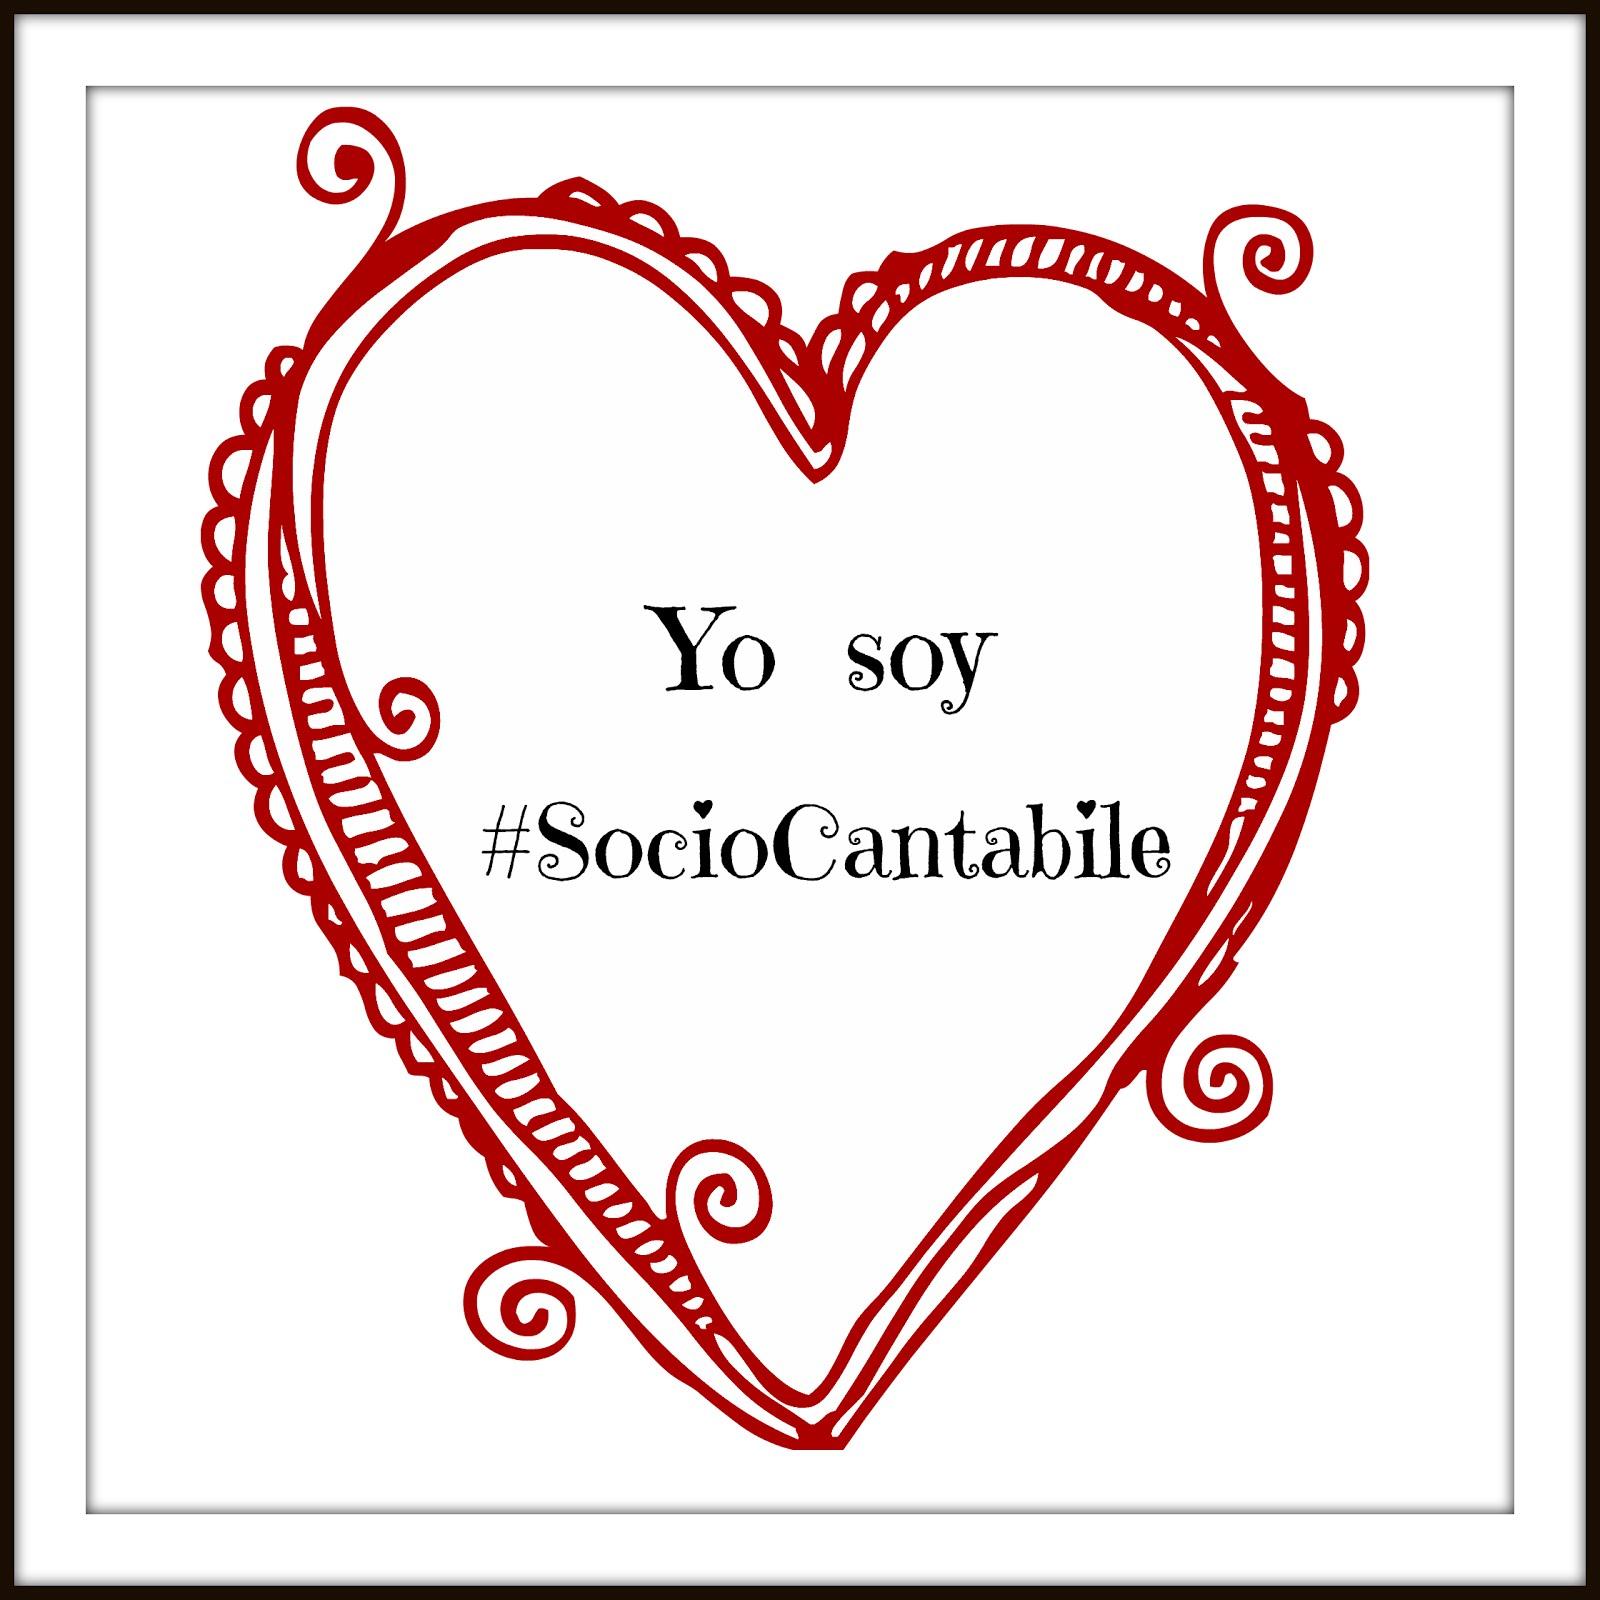 Yo soy #socioCantabile ¿Y tú?